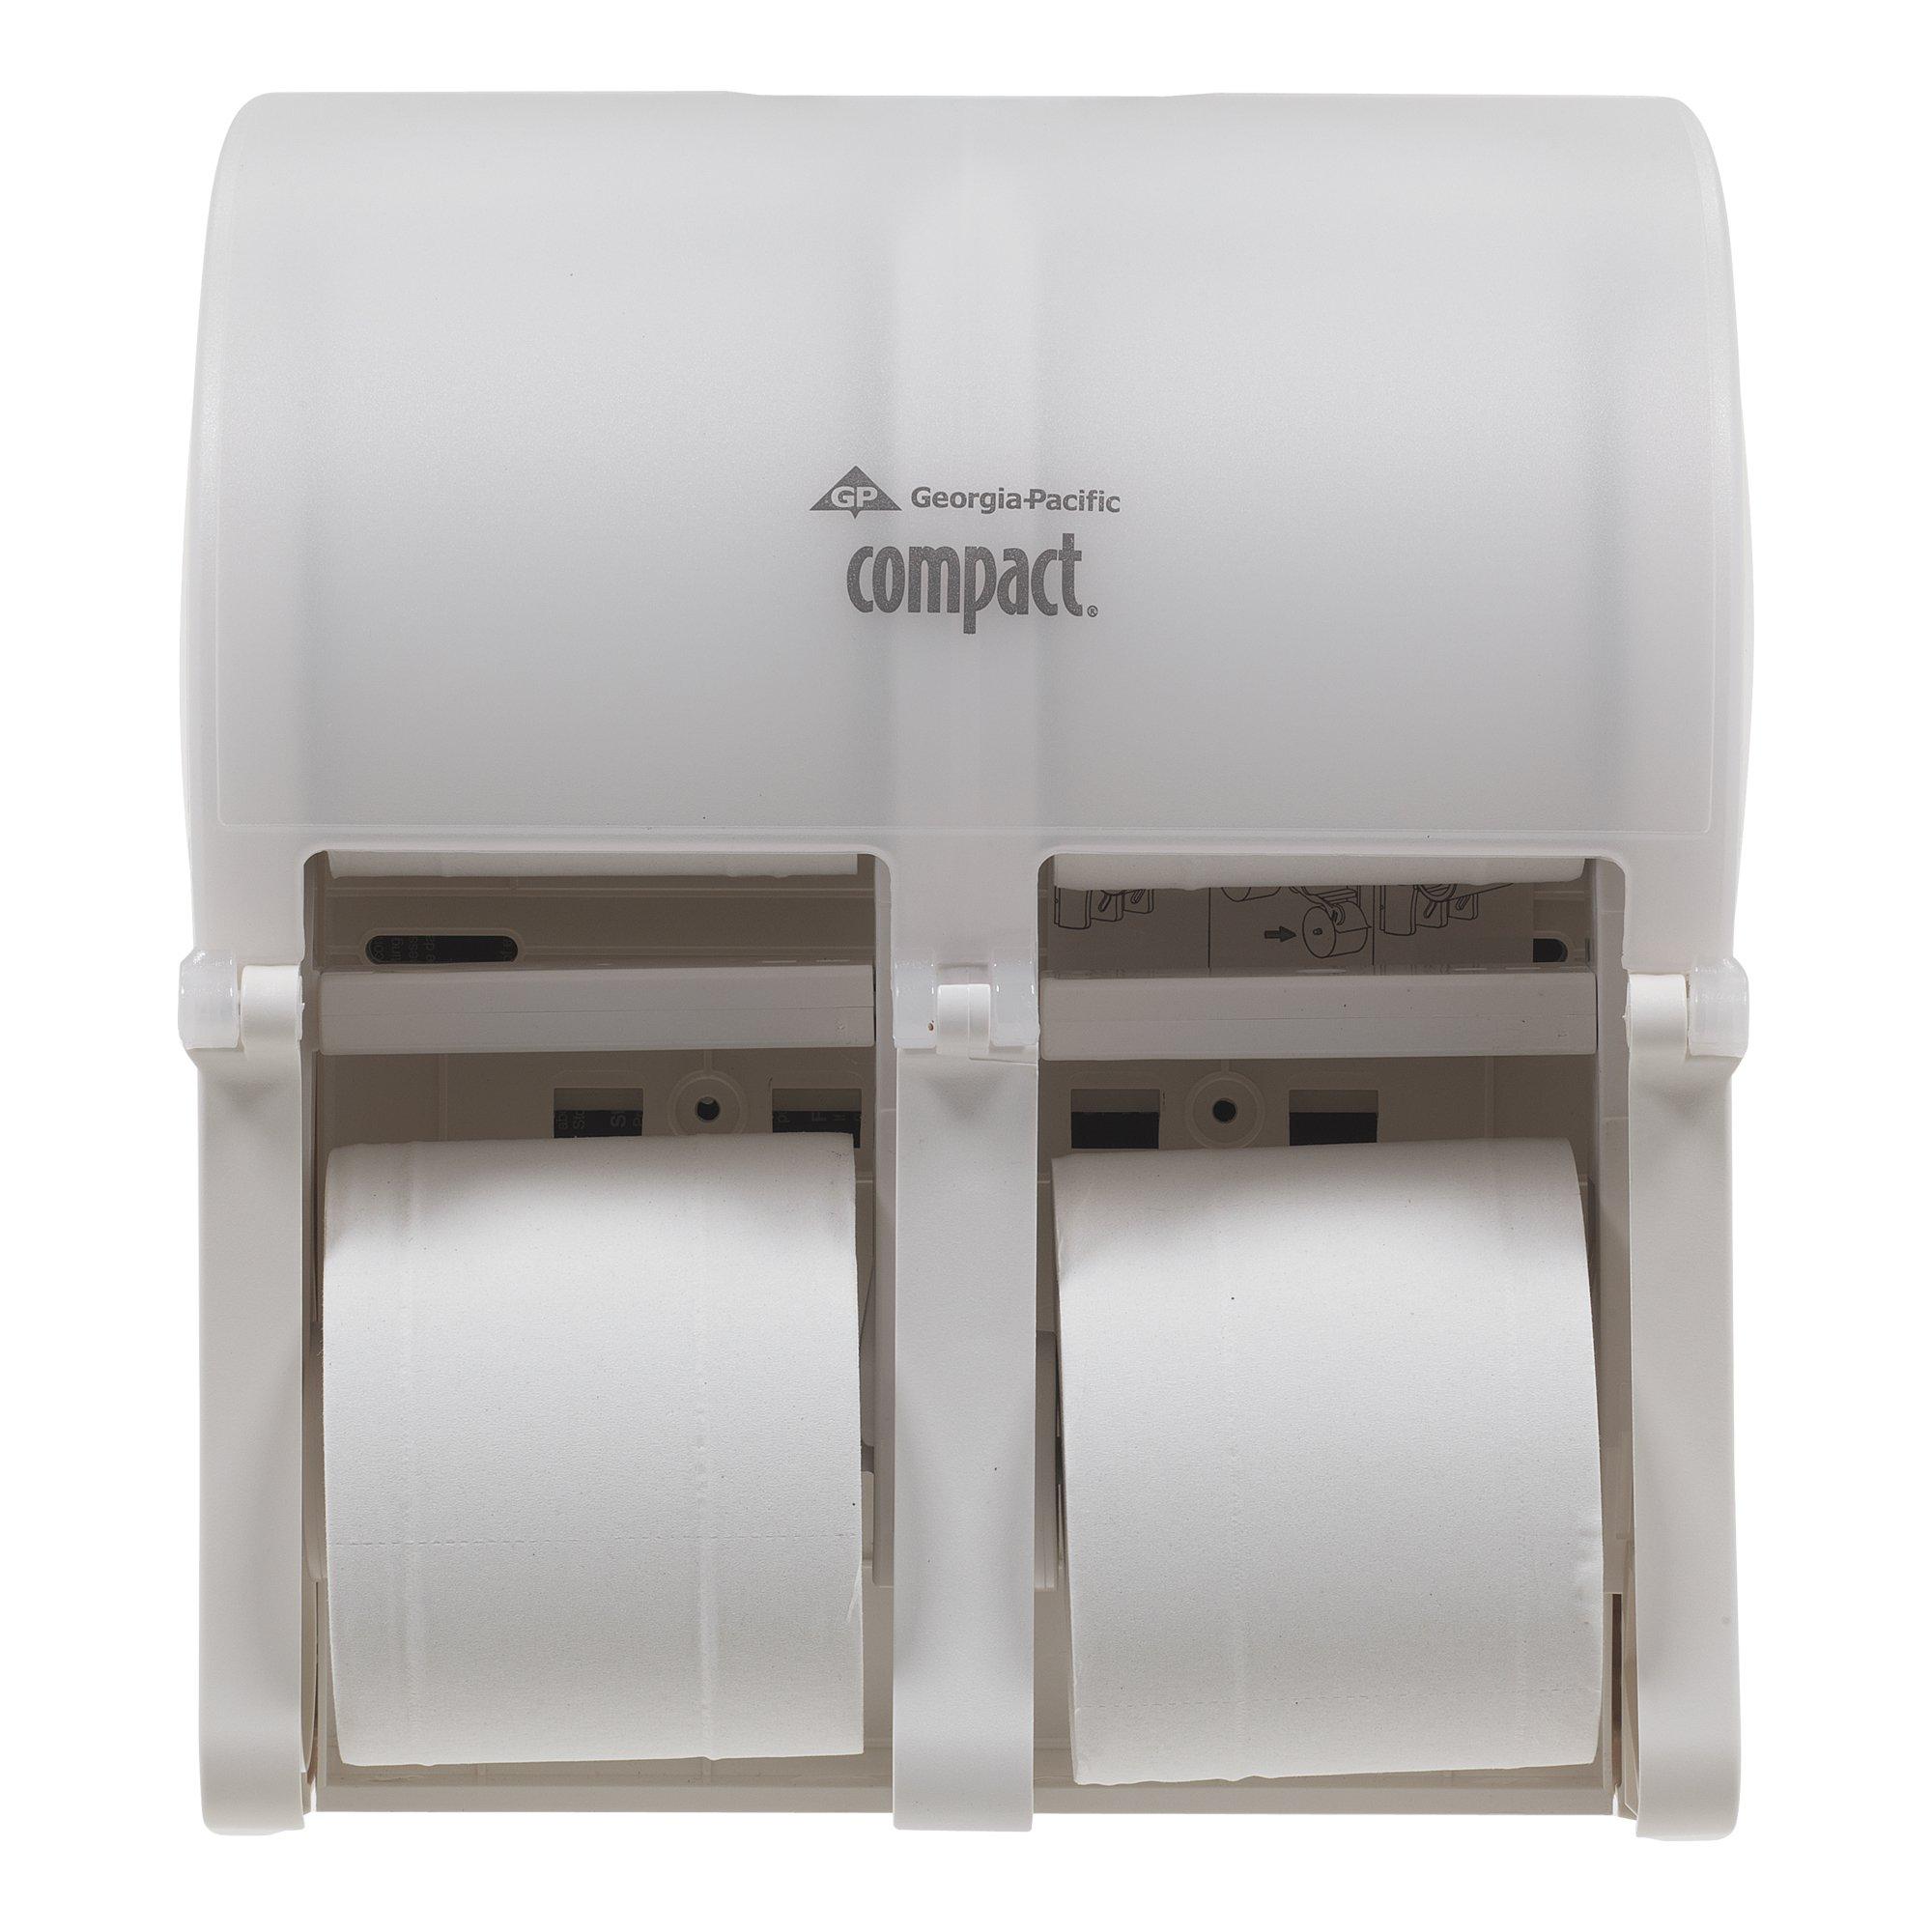 "Compact 4-Roll Quad Coreless High-Capacity Toilet Paper Dispenser by GP PRO (Georgia-Pacific), Translucent White, 56747, 11.750"" W x 6.900"" D x 13.250"" H"